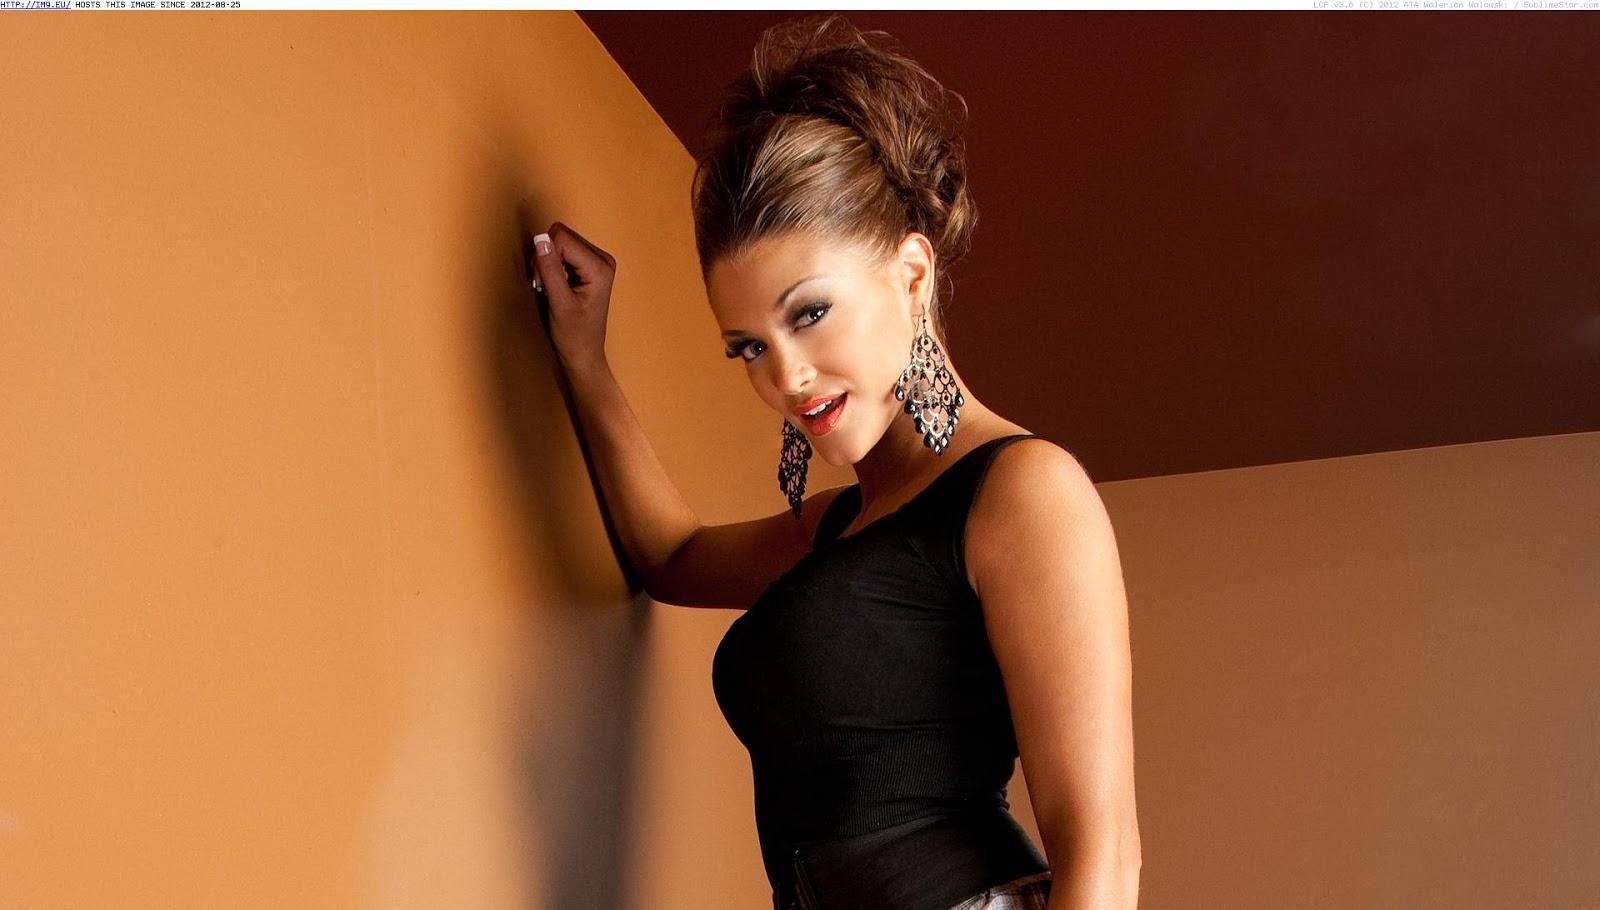 http://2.bp.blogspot.com/-c2BMBqNAXpo/ULBfrT9QmyI/AAAAAAAAFo8/KLQ00irVA10/s1600/WWE+Eve+Torres+hd+Wallpapers+2012_3.jpg